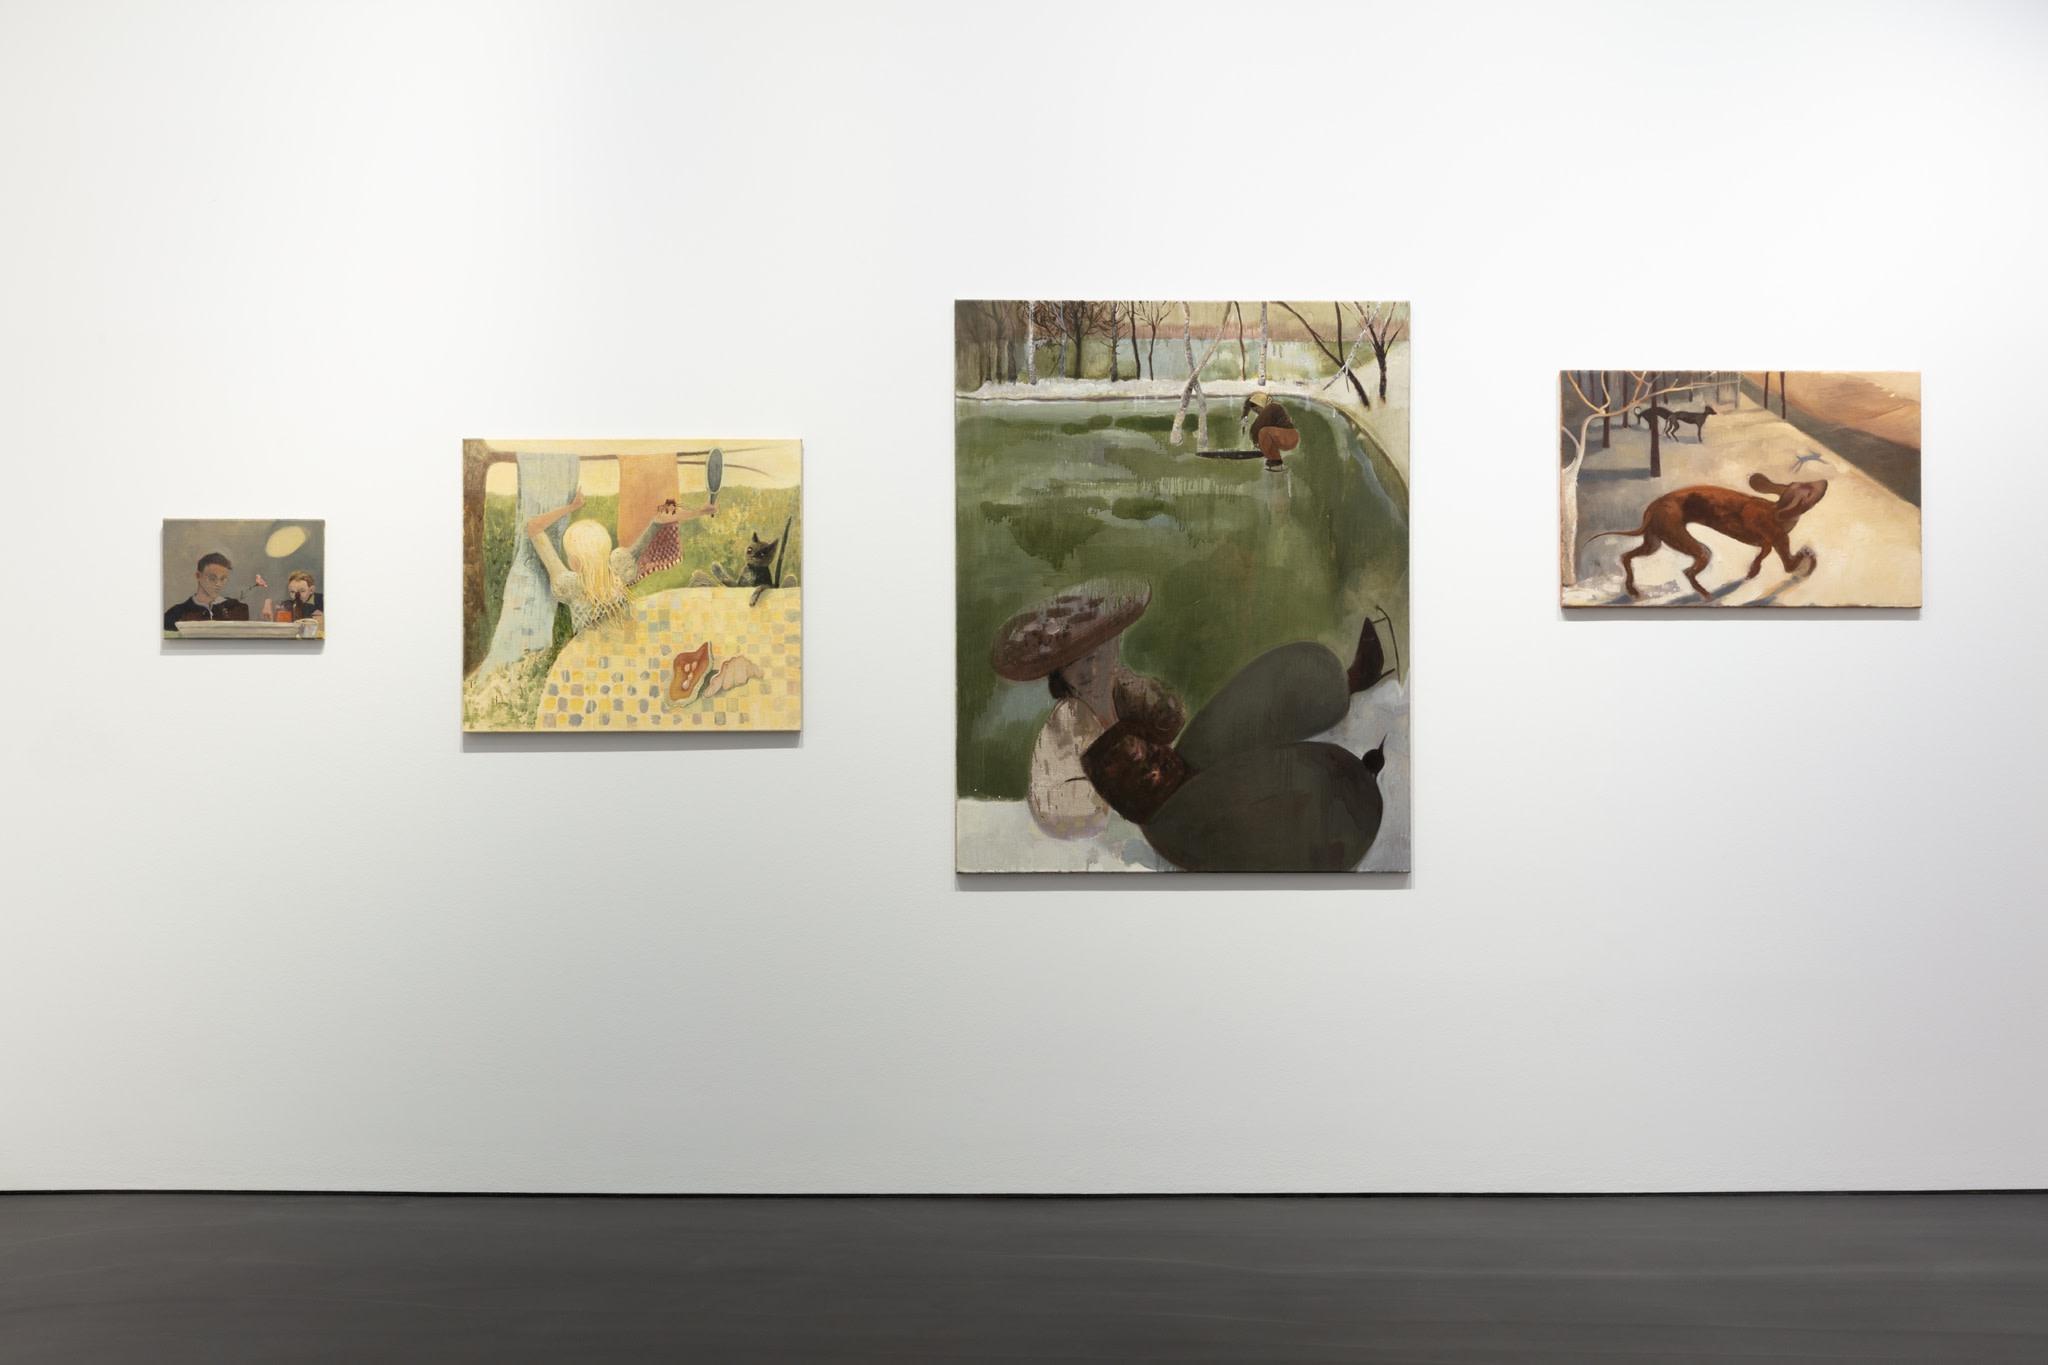 Works by Sarah Buckner. Exhibition view: L'Invitation au voyage, Esther Schipper, Berlin. Photo © Andrea Rossetti